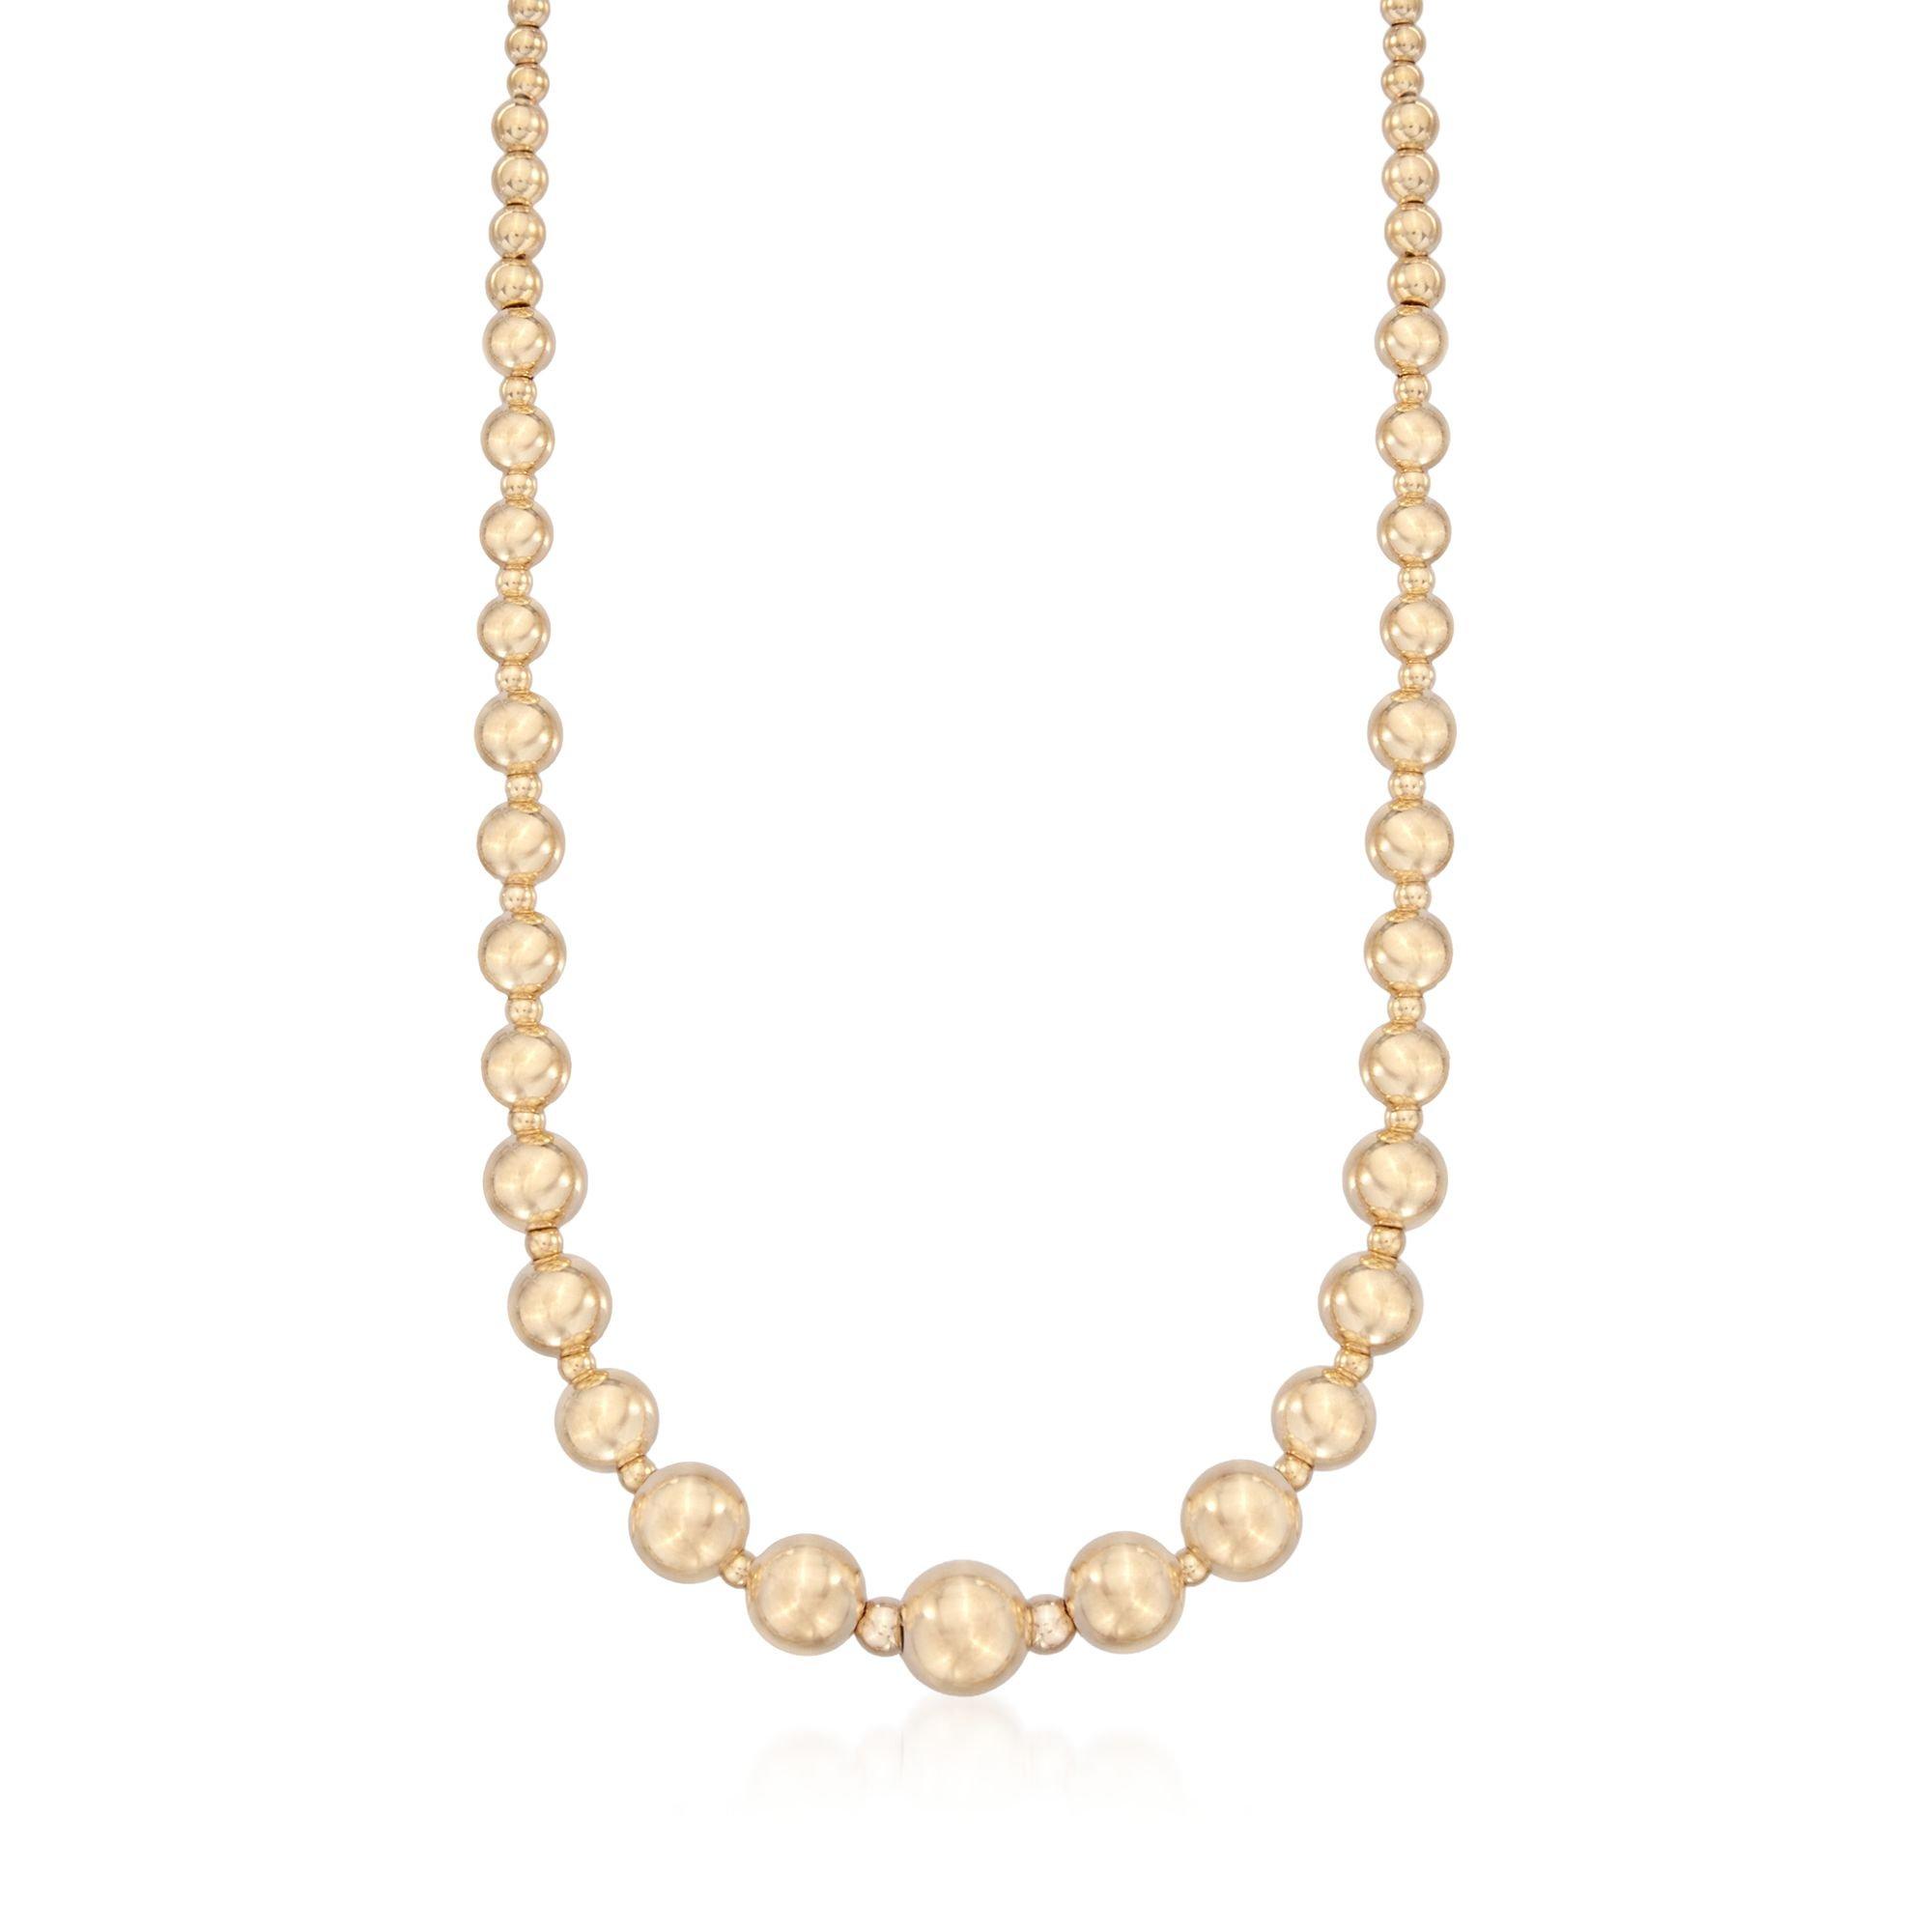 Ross-Simons Italian 14kt Yellow Gold Graduated Bead Necklace